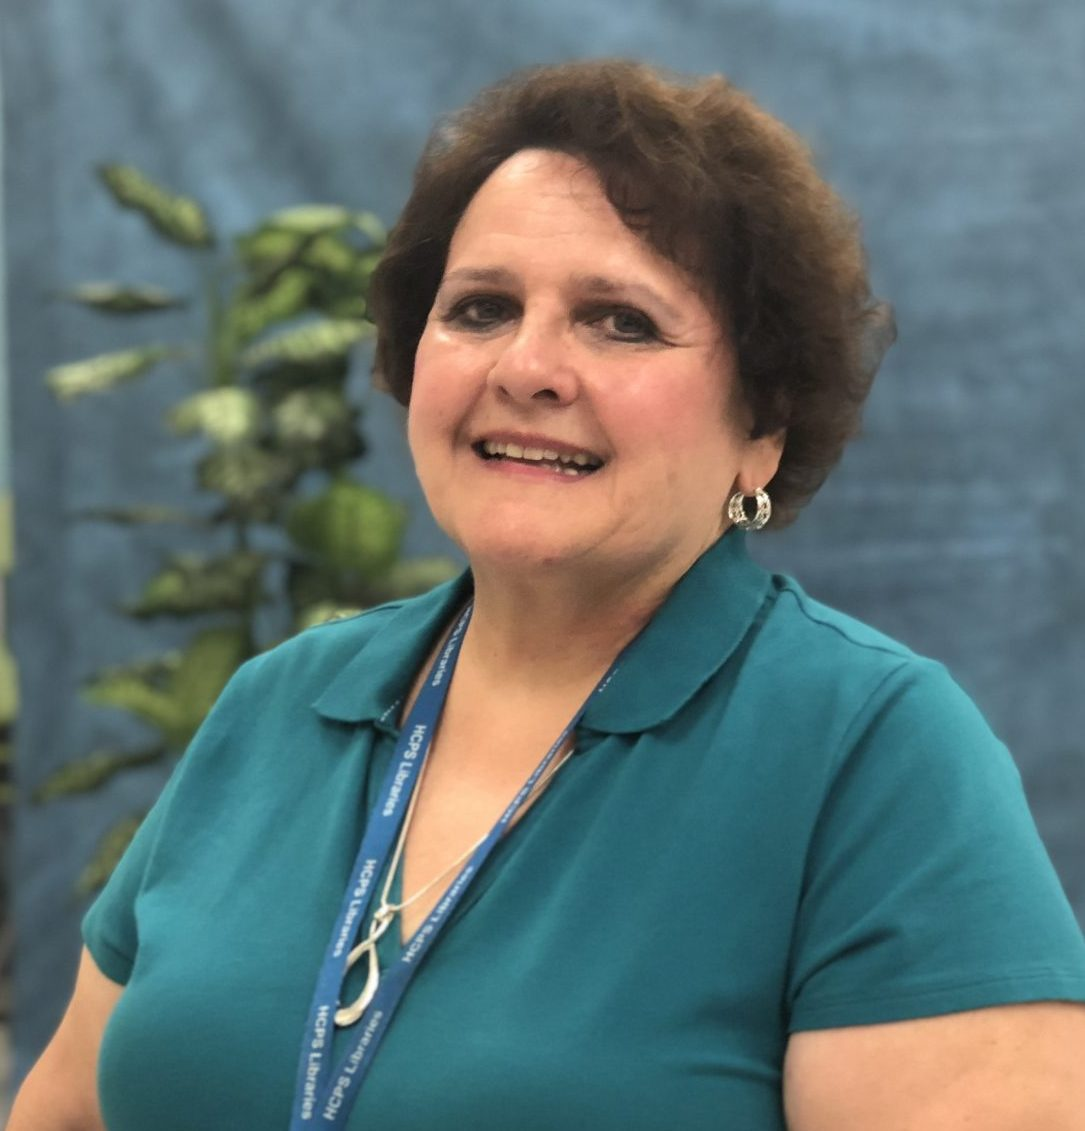 image of Sue Harner